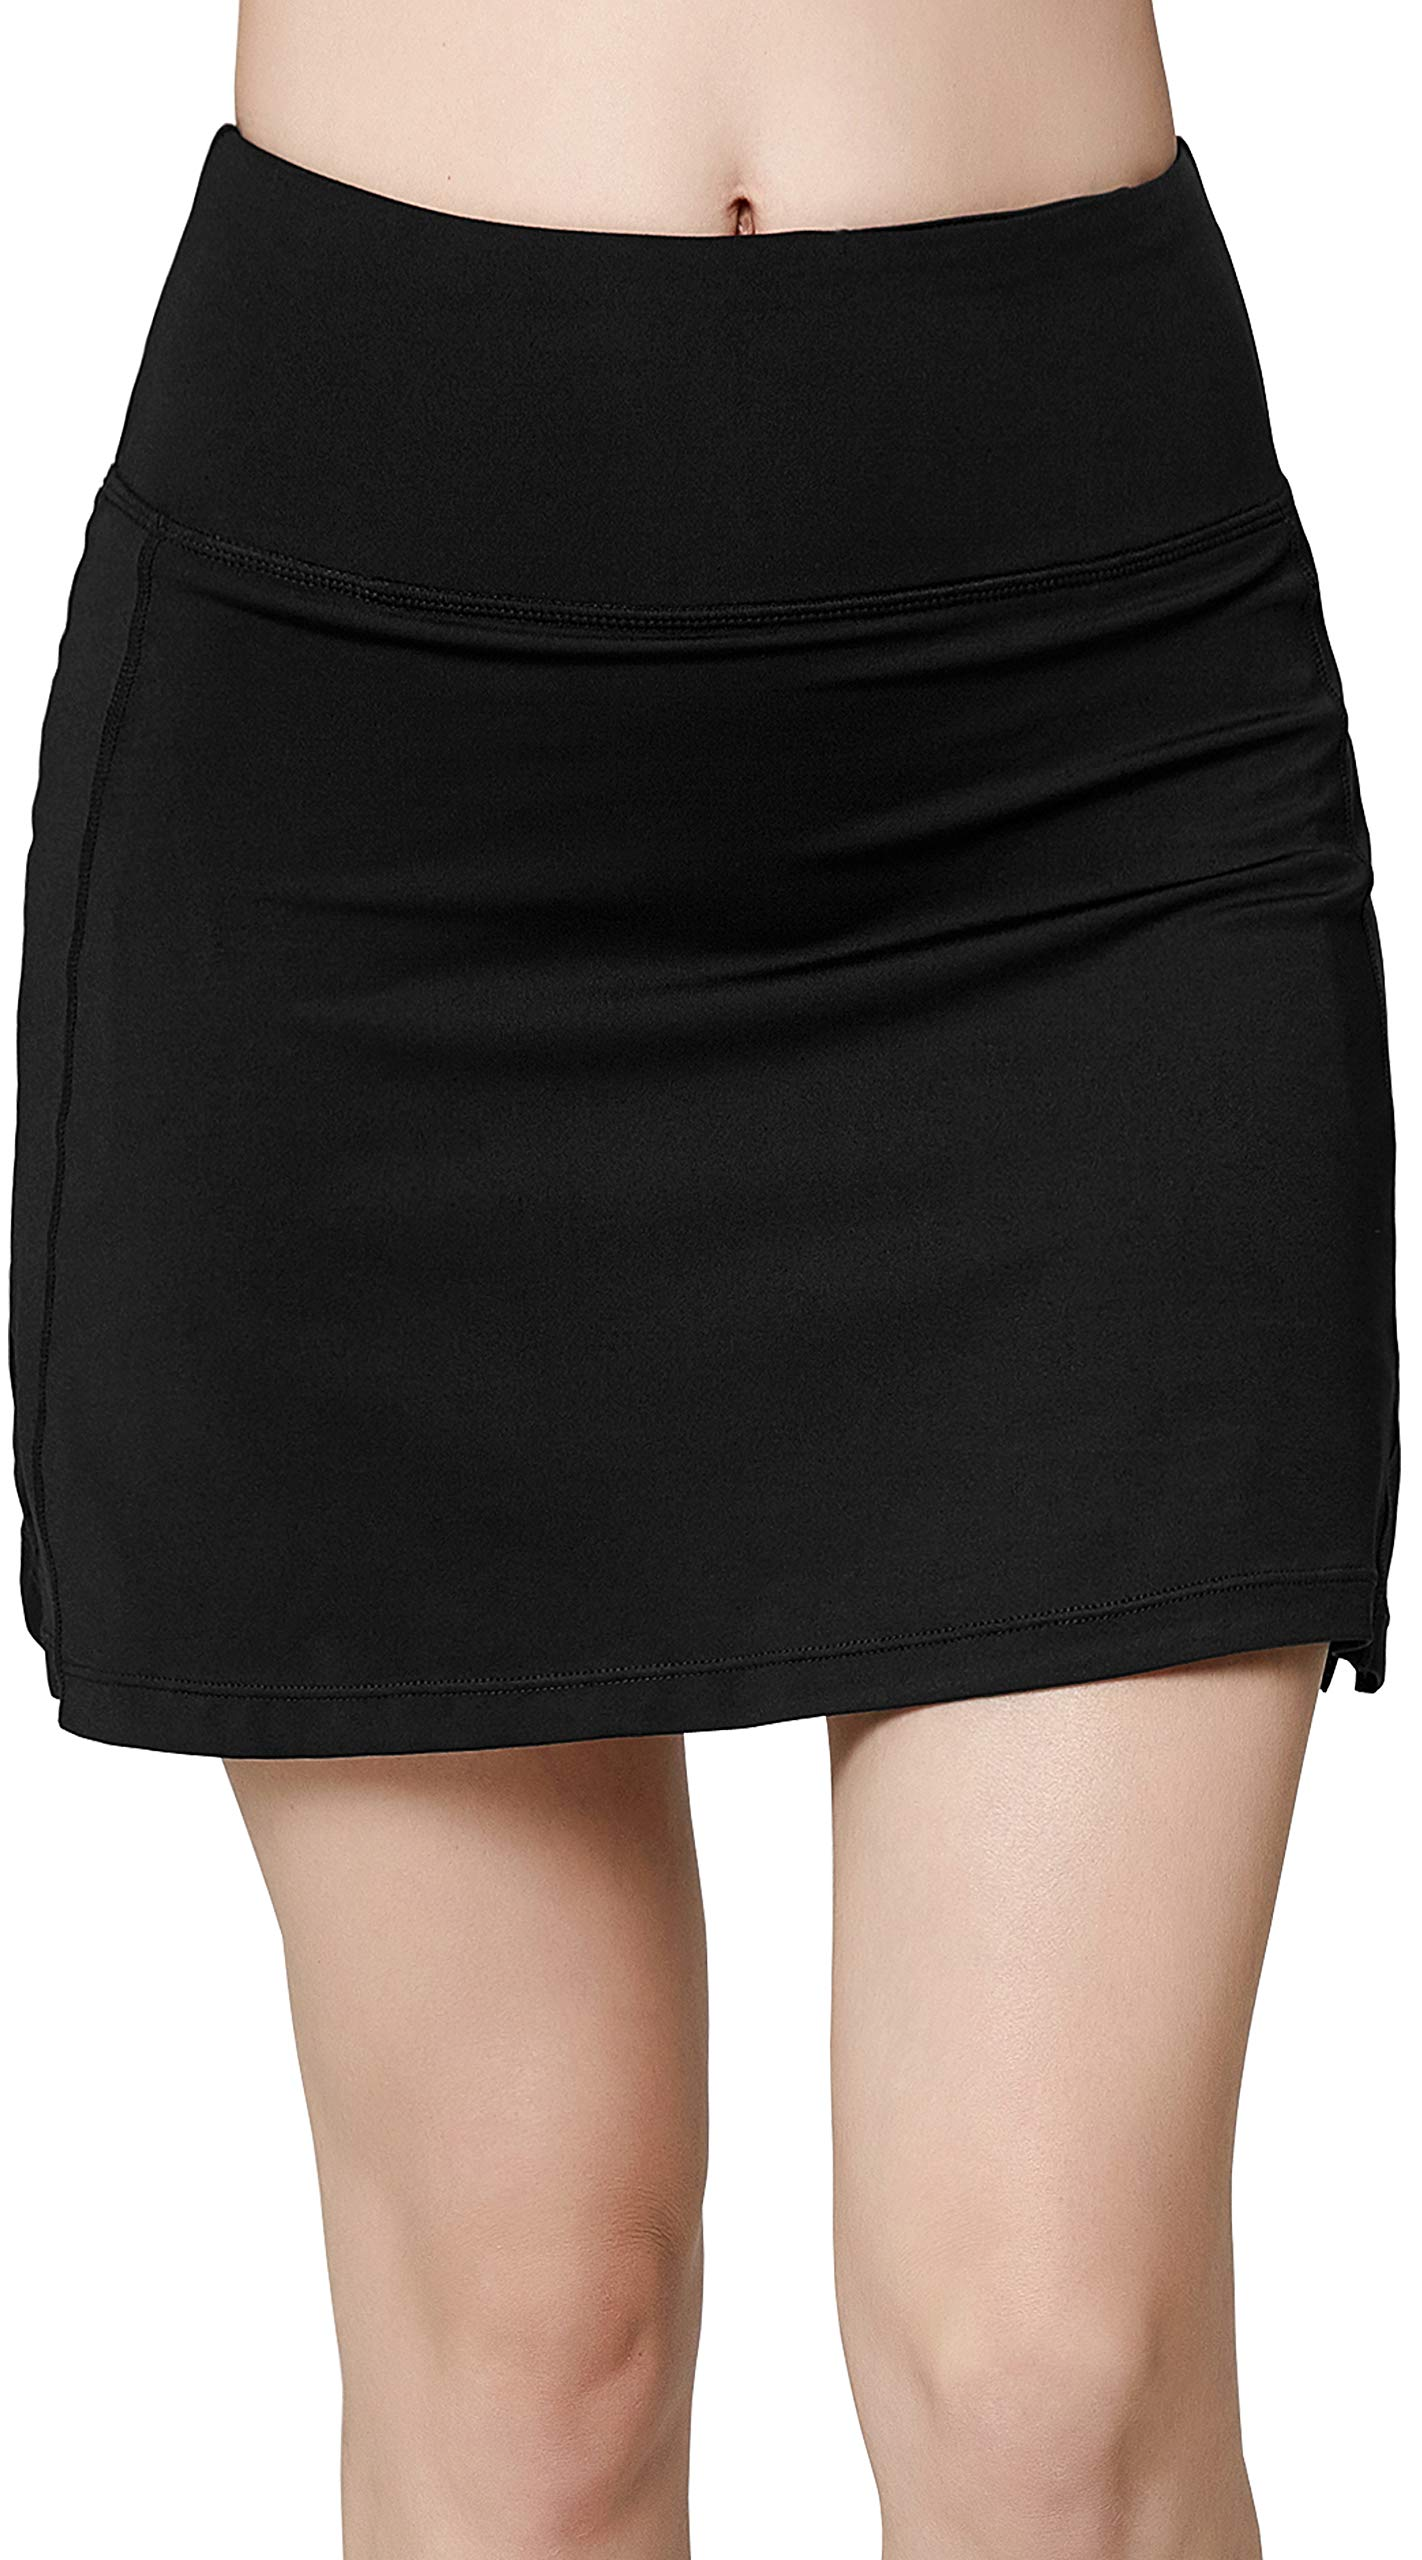 Women's Active Athletic Skirt Sports Golf Tennis Running Pockets Skort Black L by Oalka